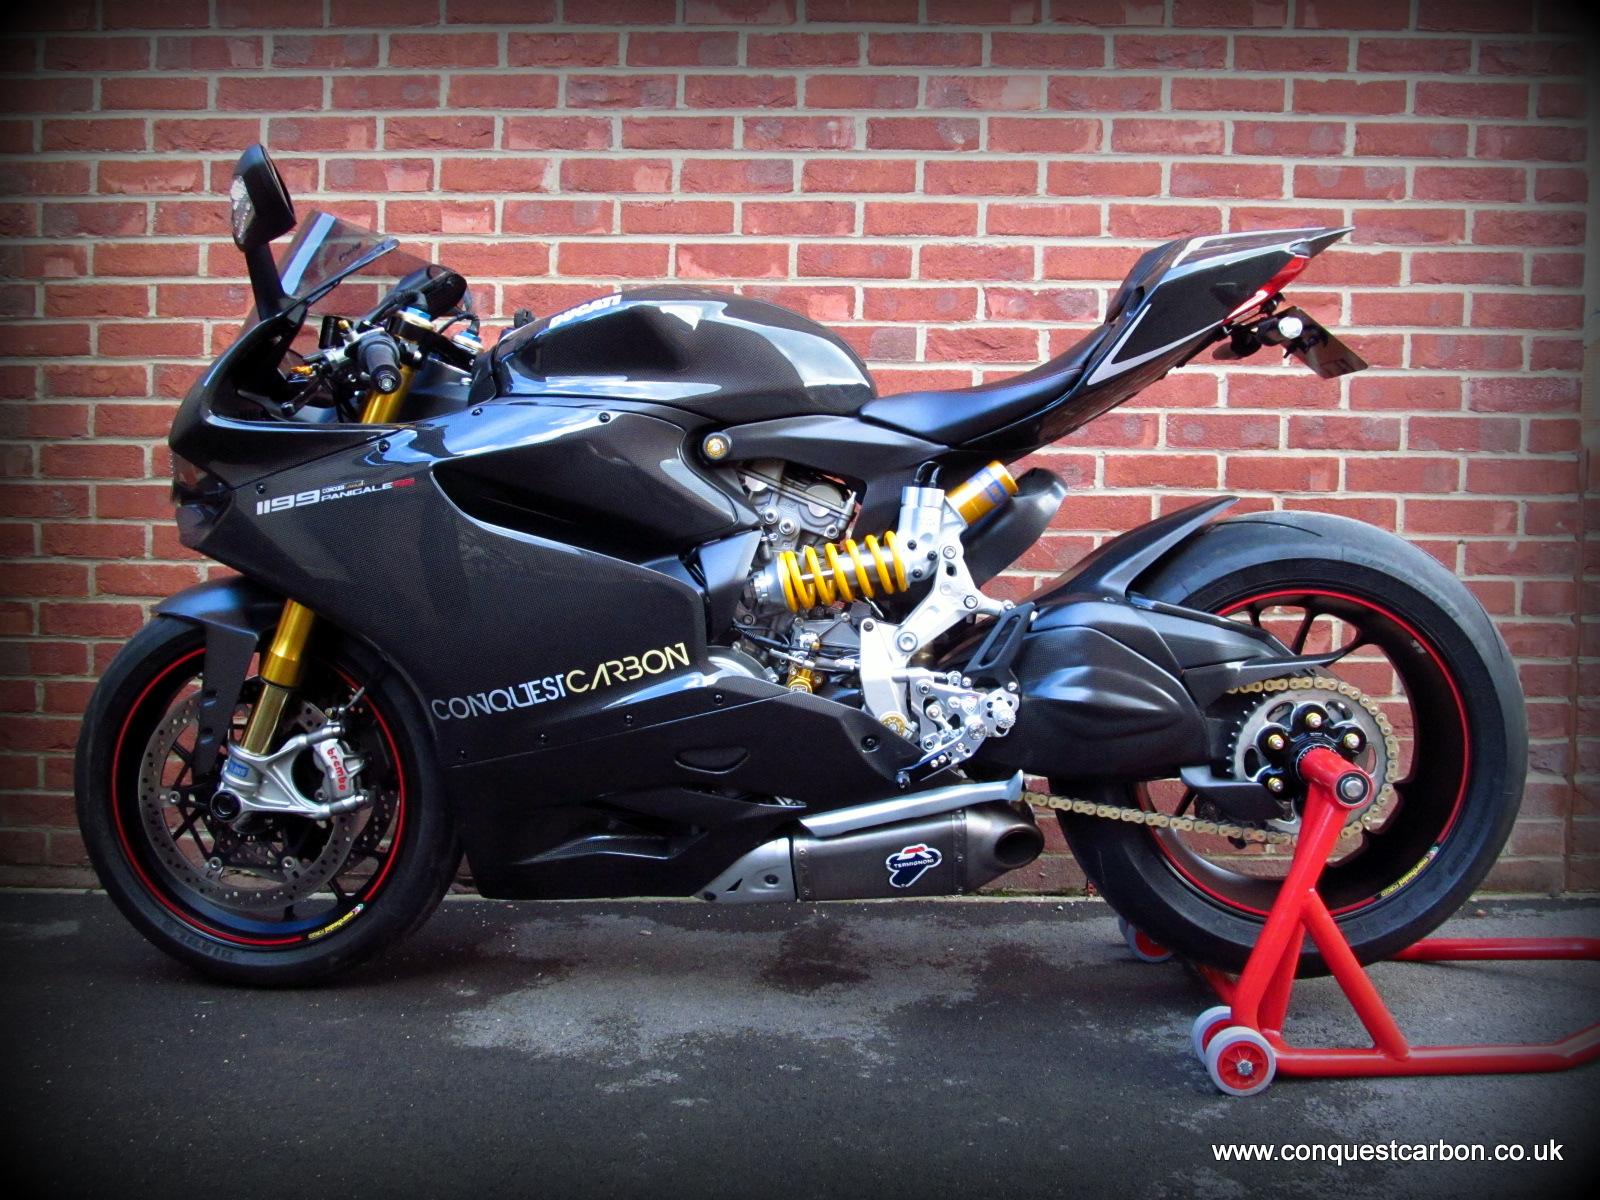 Conquest Carbon's Ducati Panigale 1199RS Show Bike